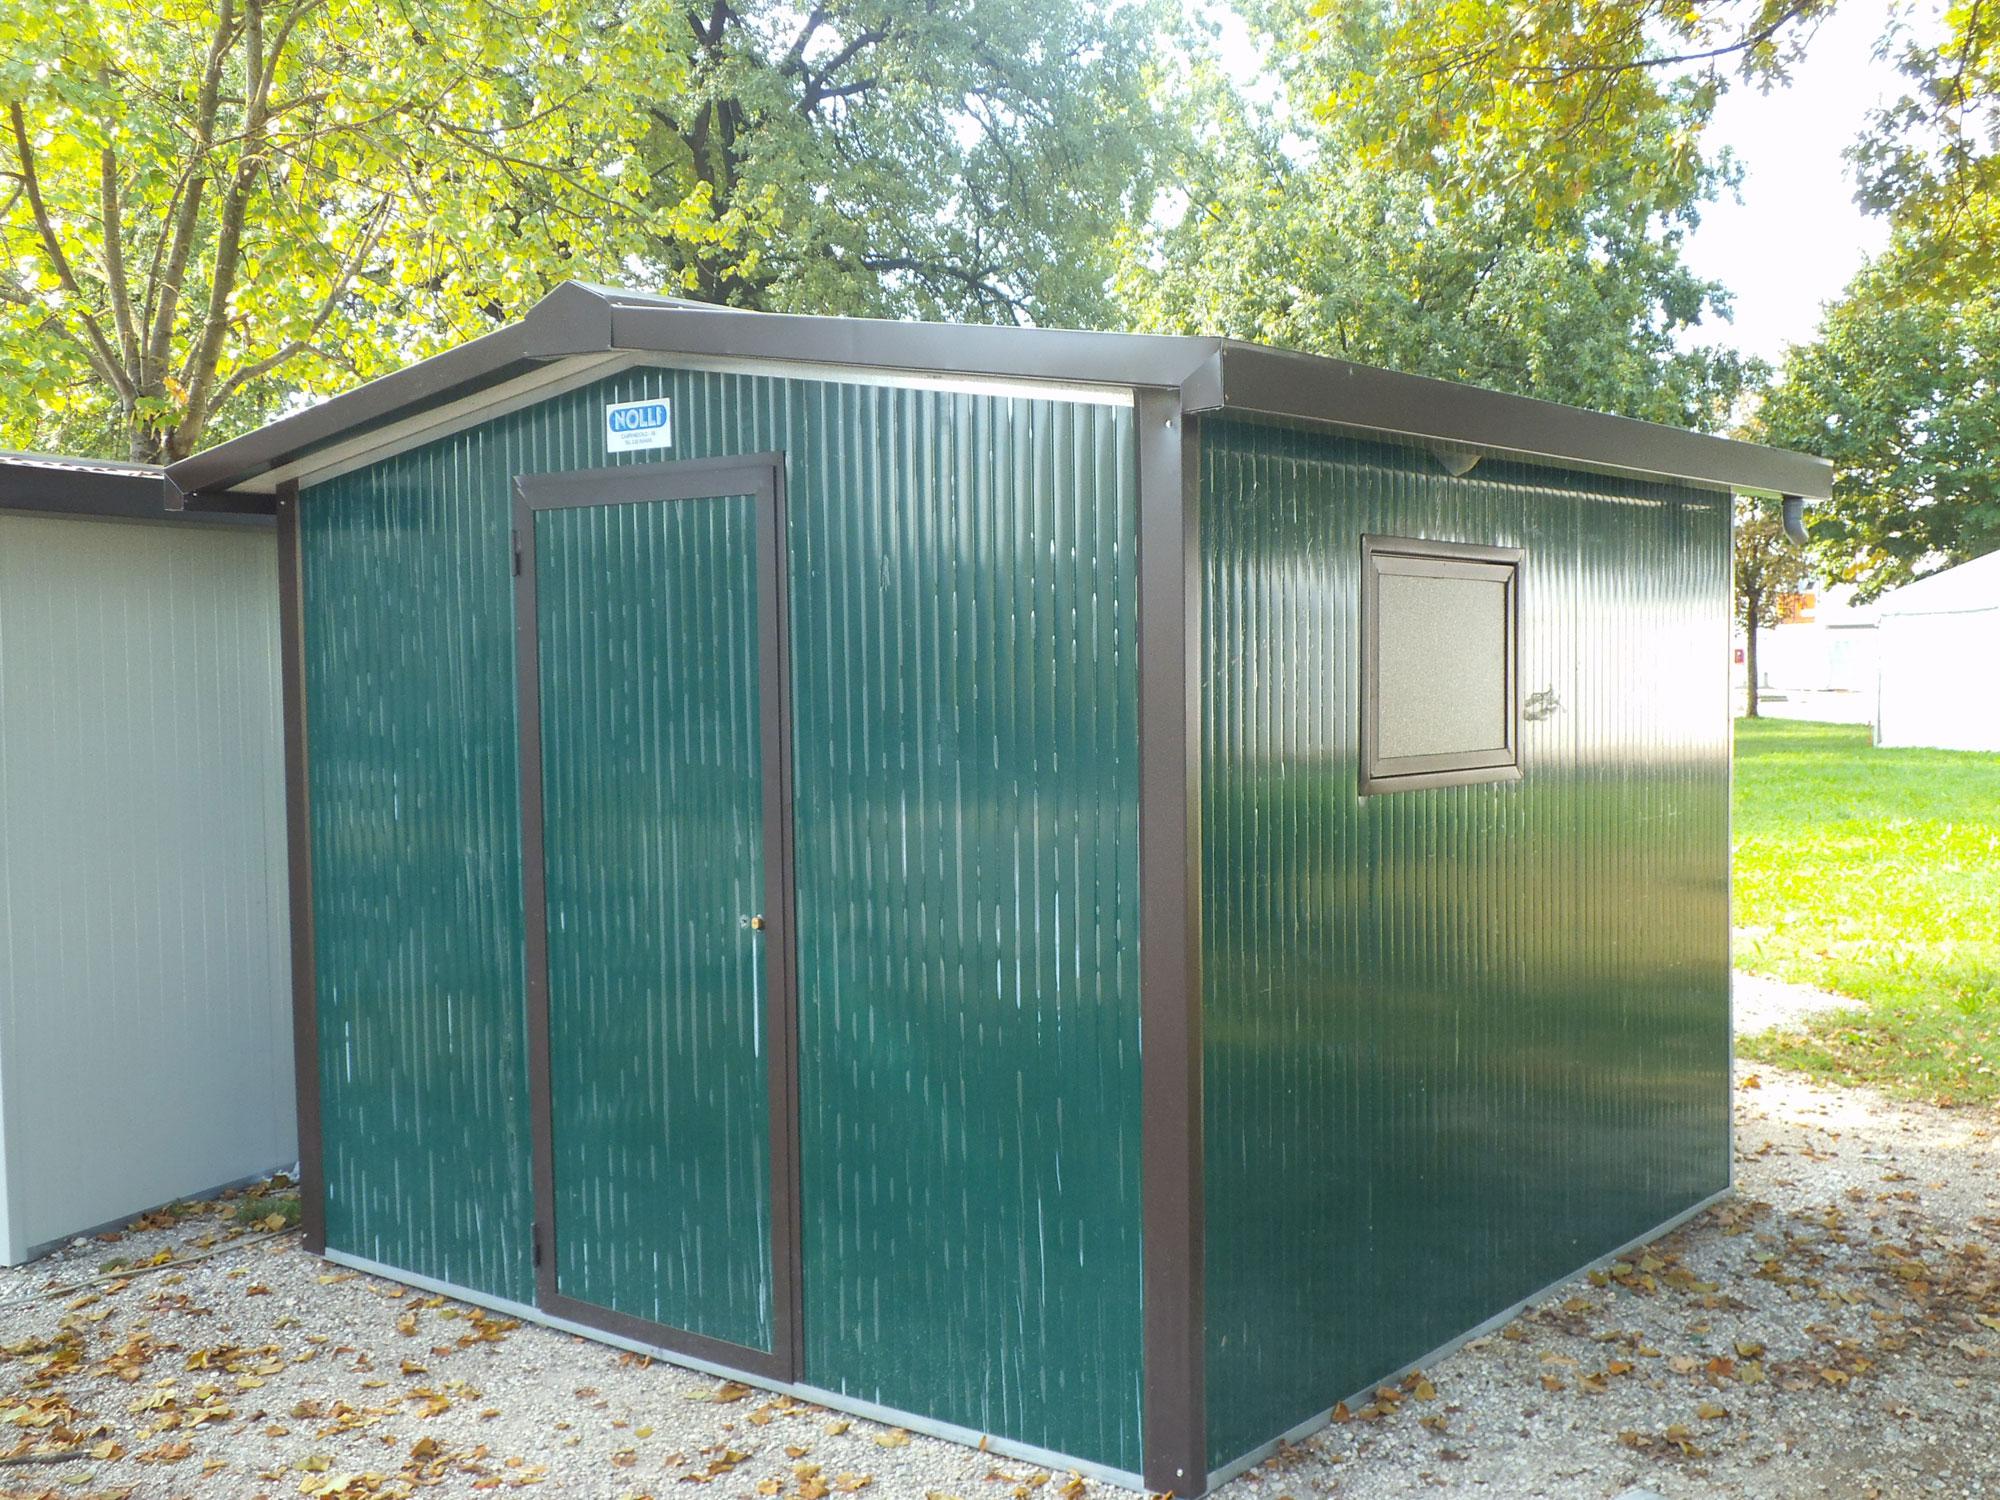 Casette da giardino nolli srl box prefabbricati - Prefabbricati da giardino ...